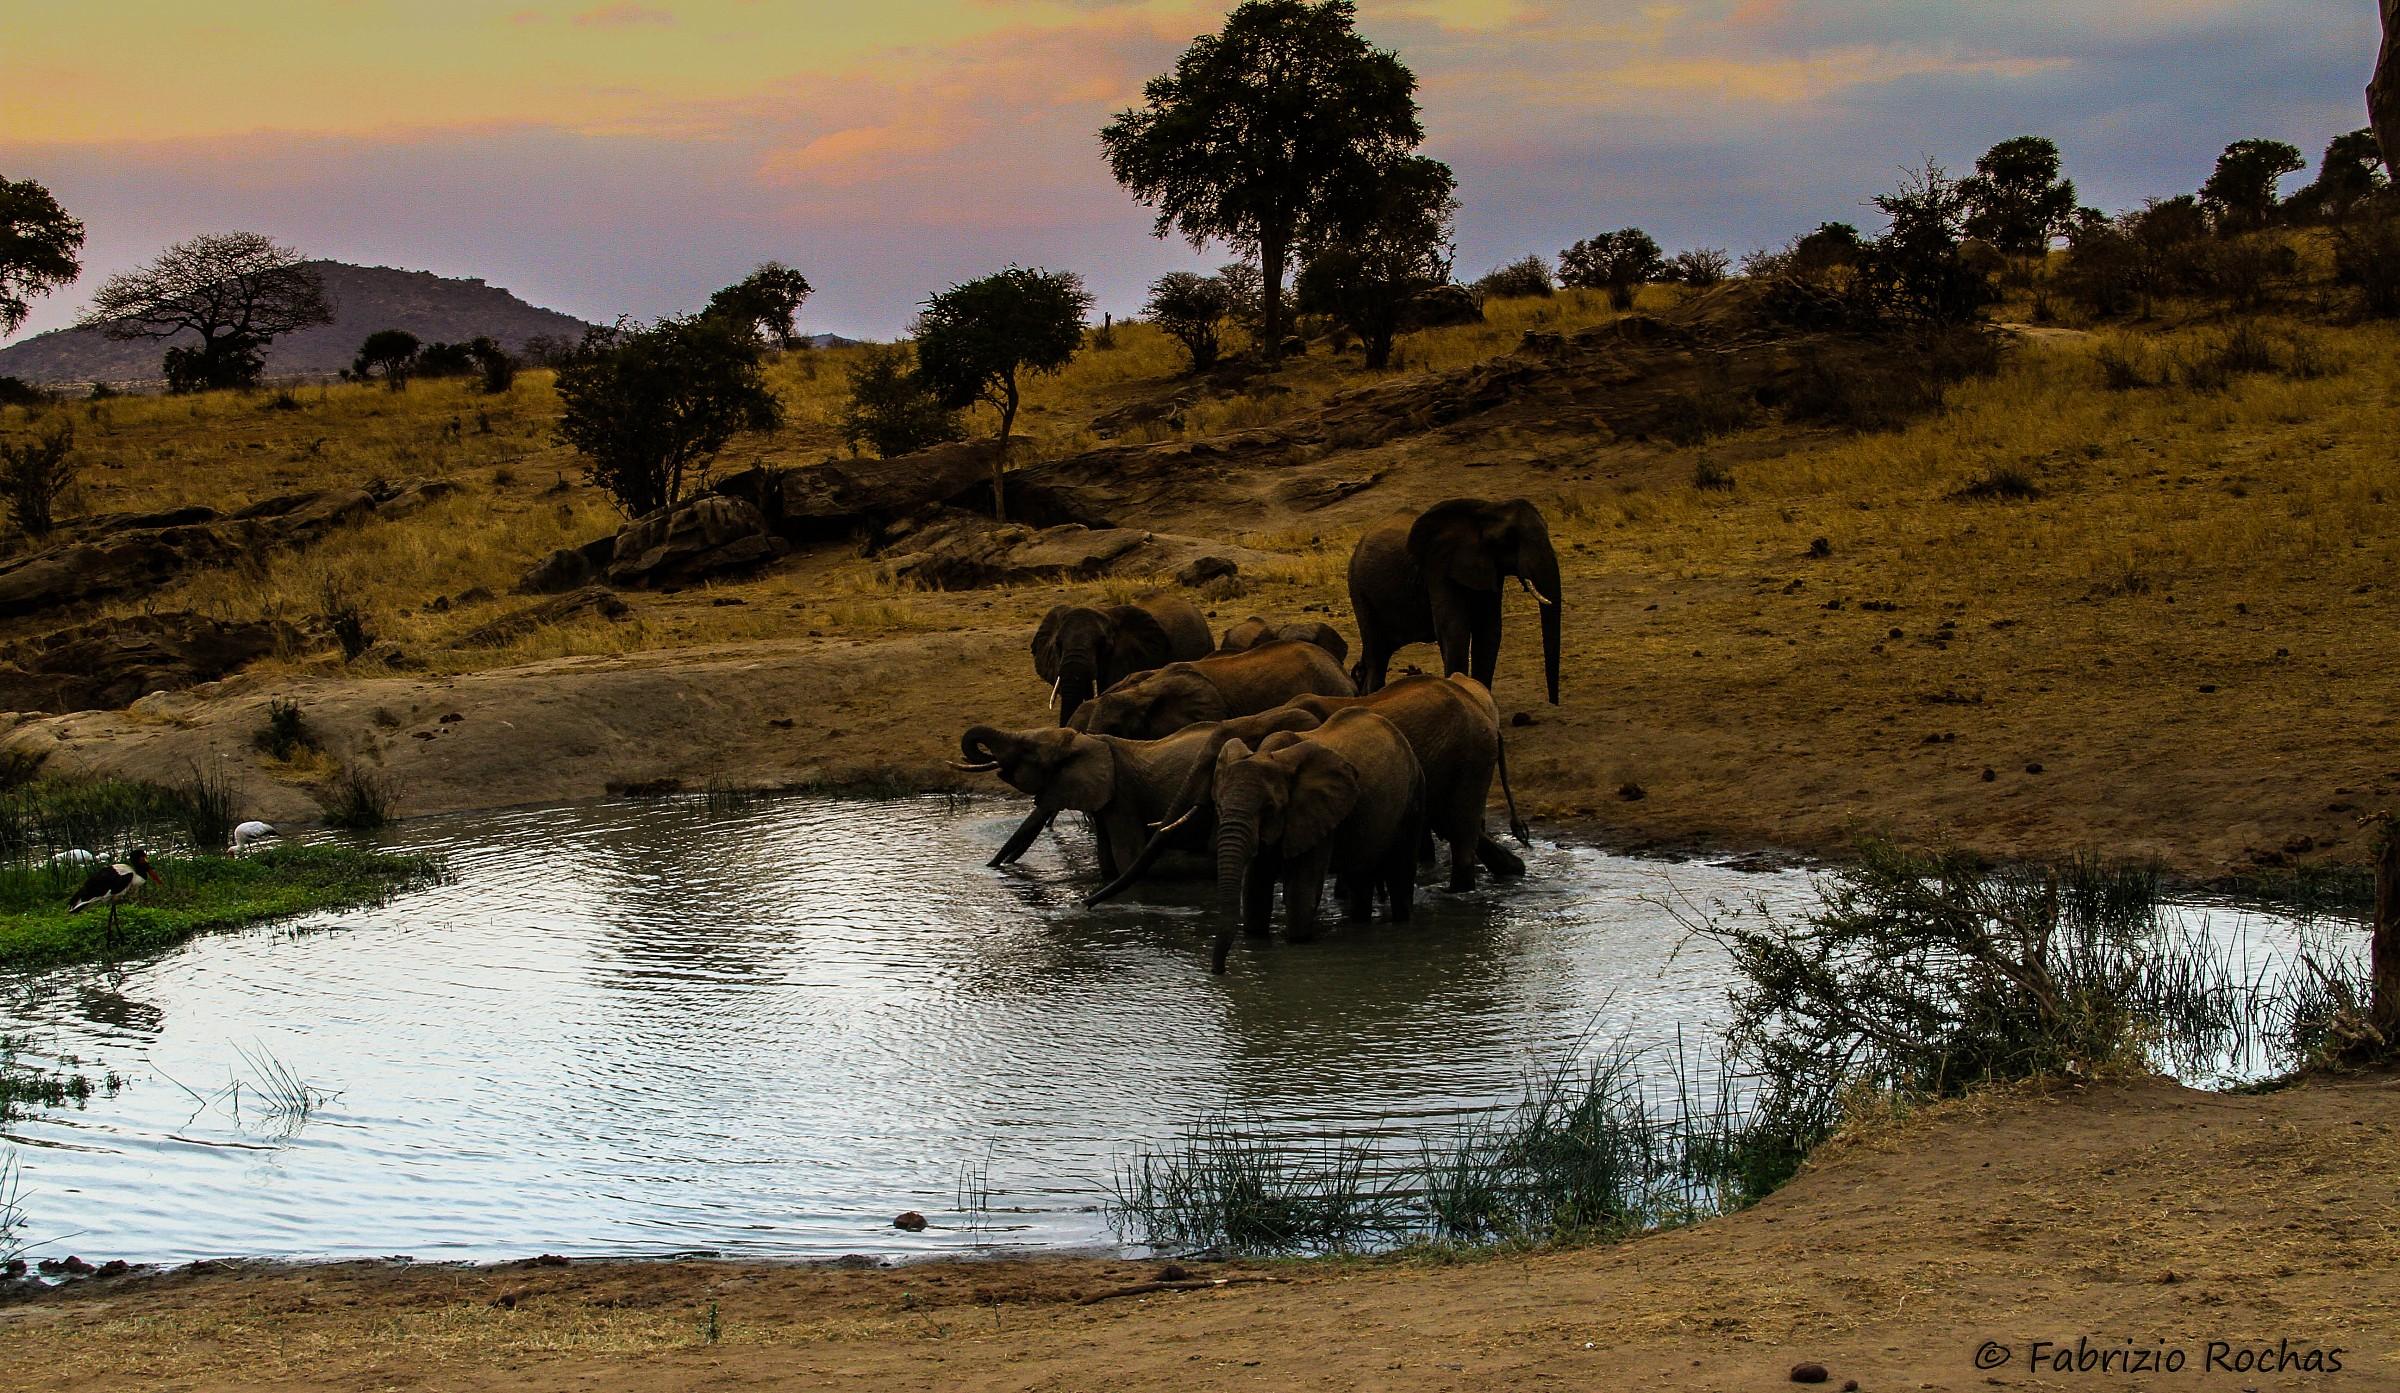 Watering evening...